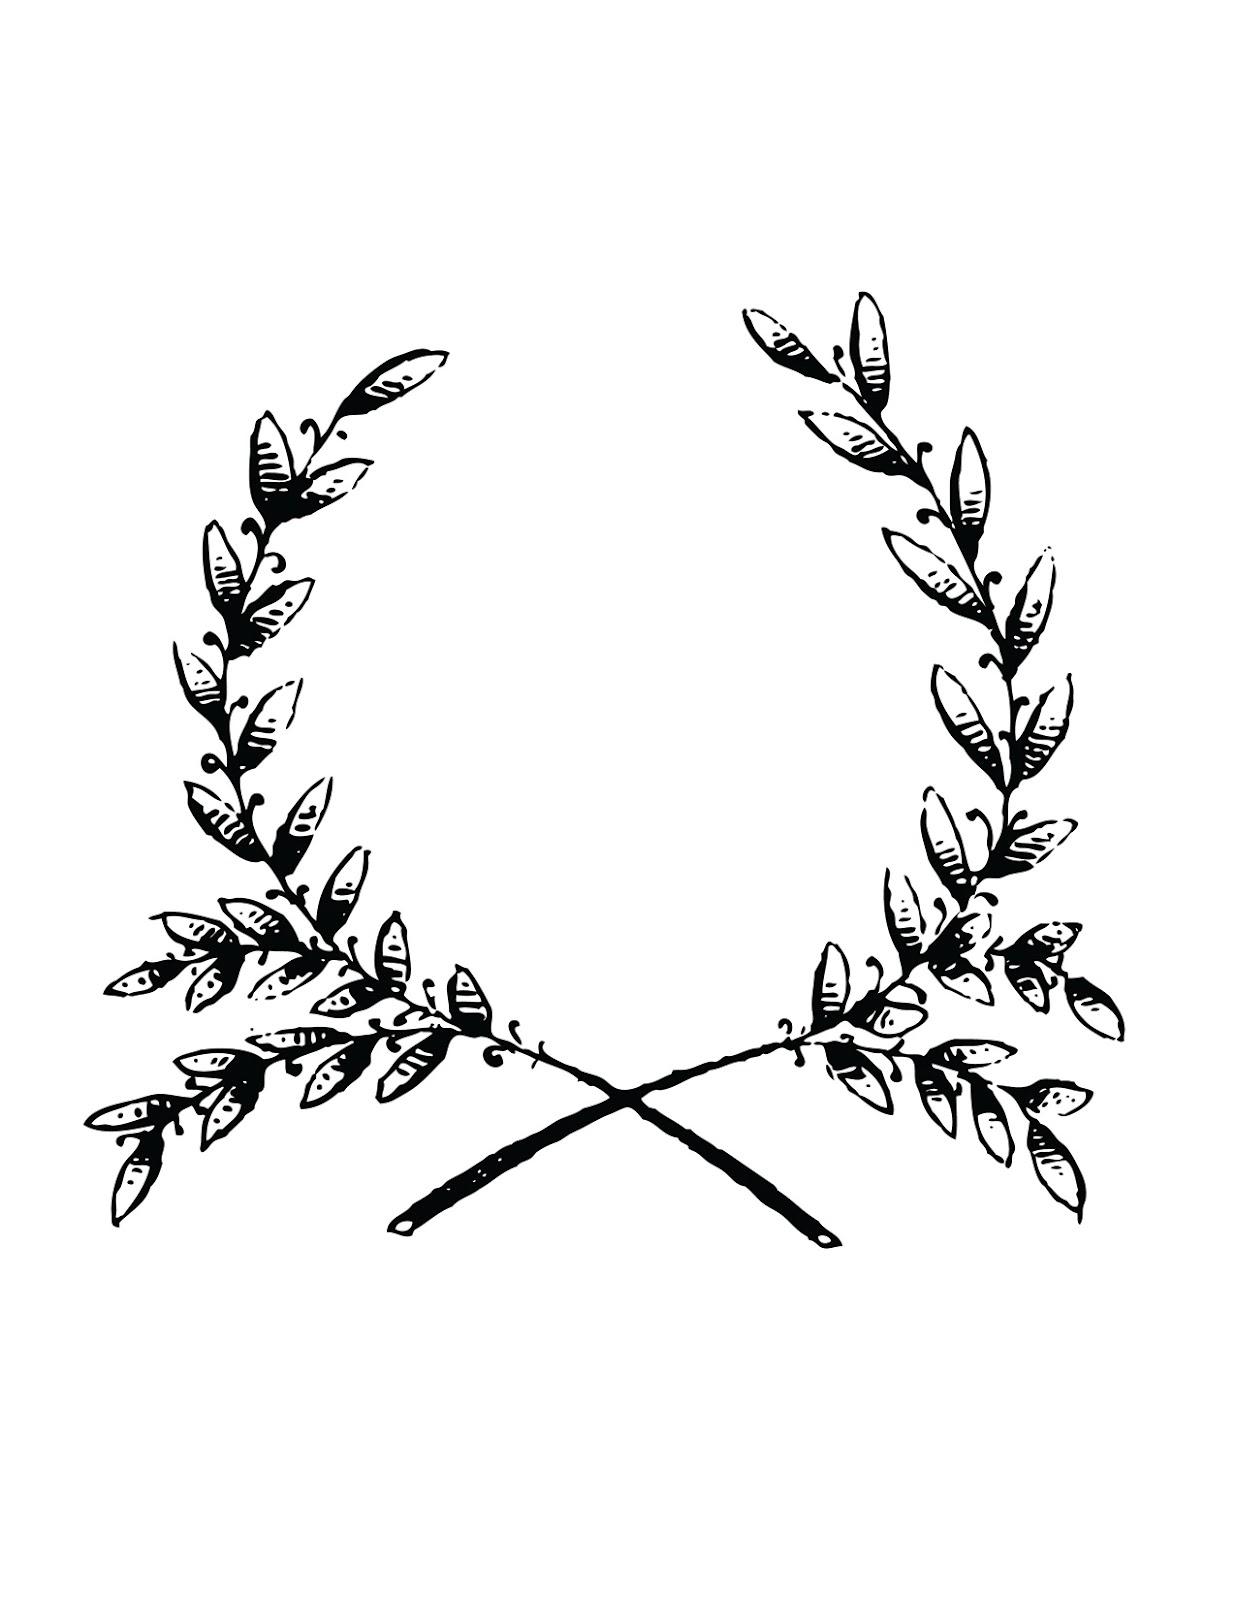 Laurel wreath More | Art | Pinterest | Tatuajes, Bordado y Tatoo